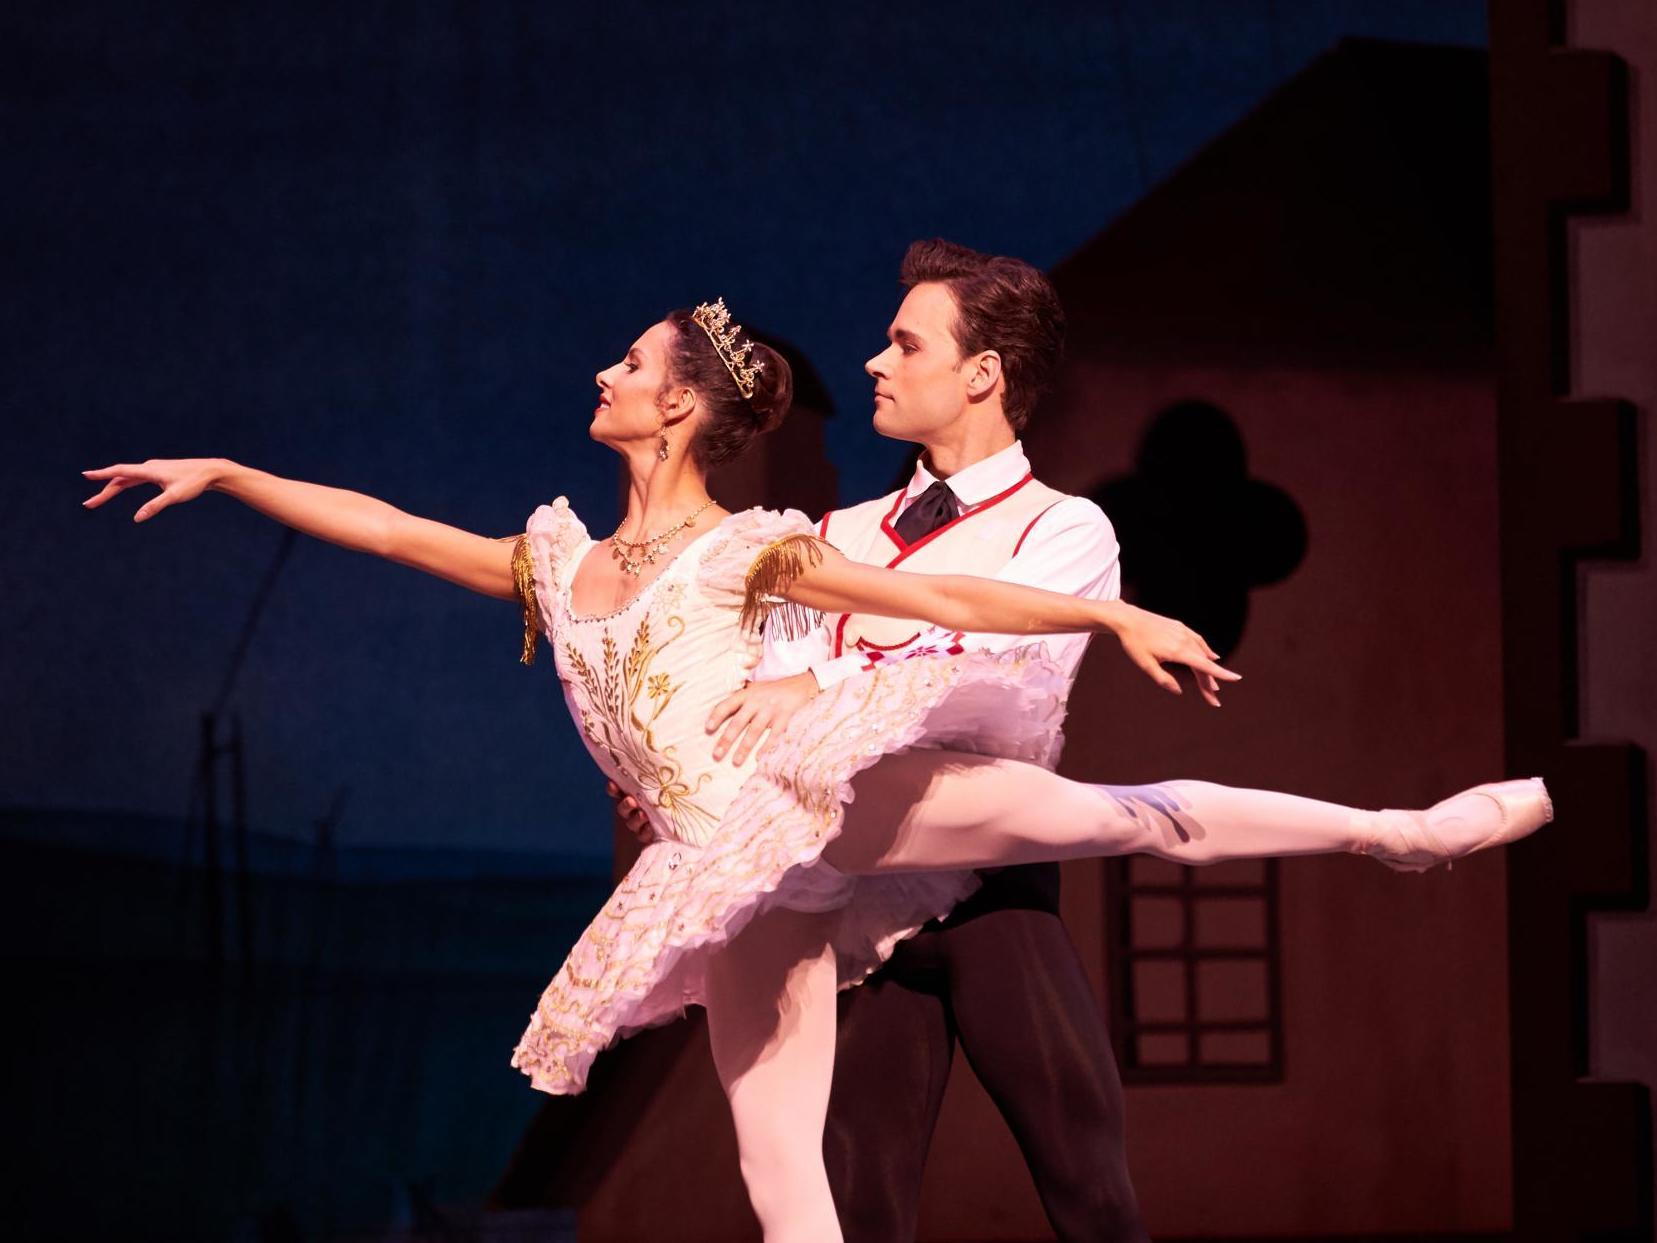 Coppélia at The Royal Ballet, review: A splendid alternative tale of dancing dolls for the festive season